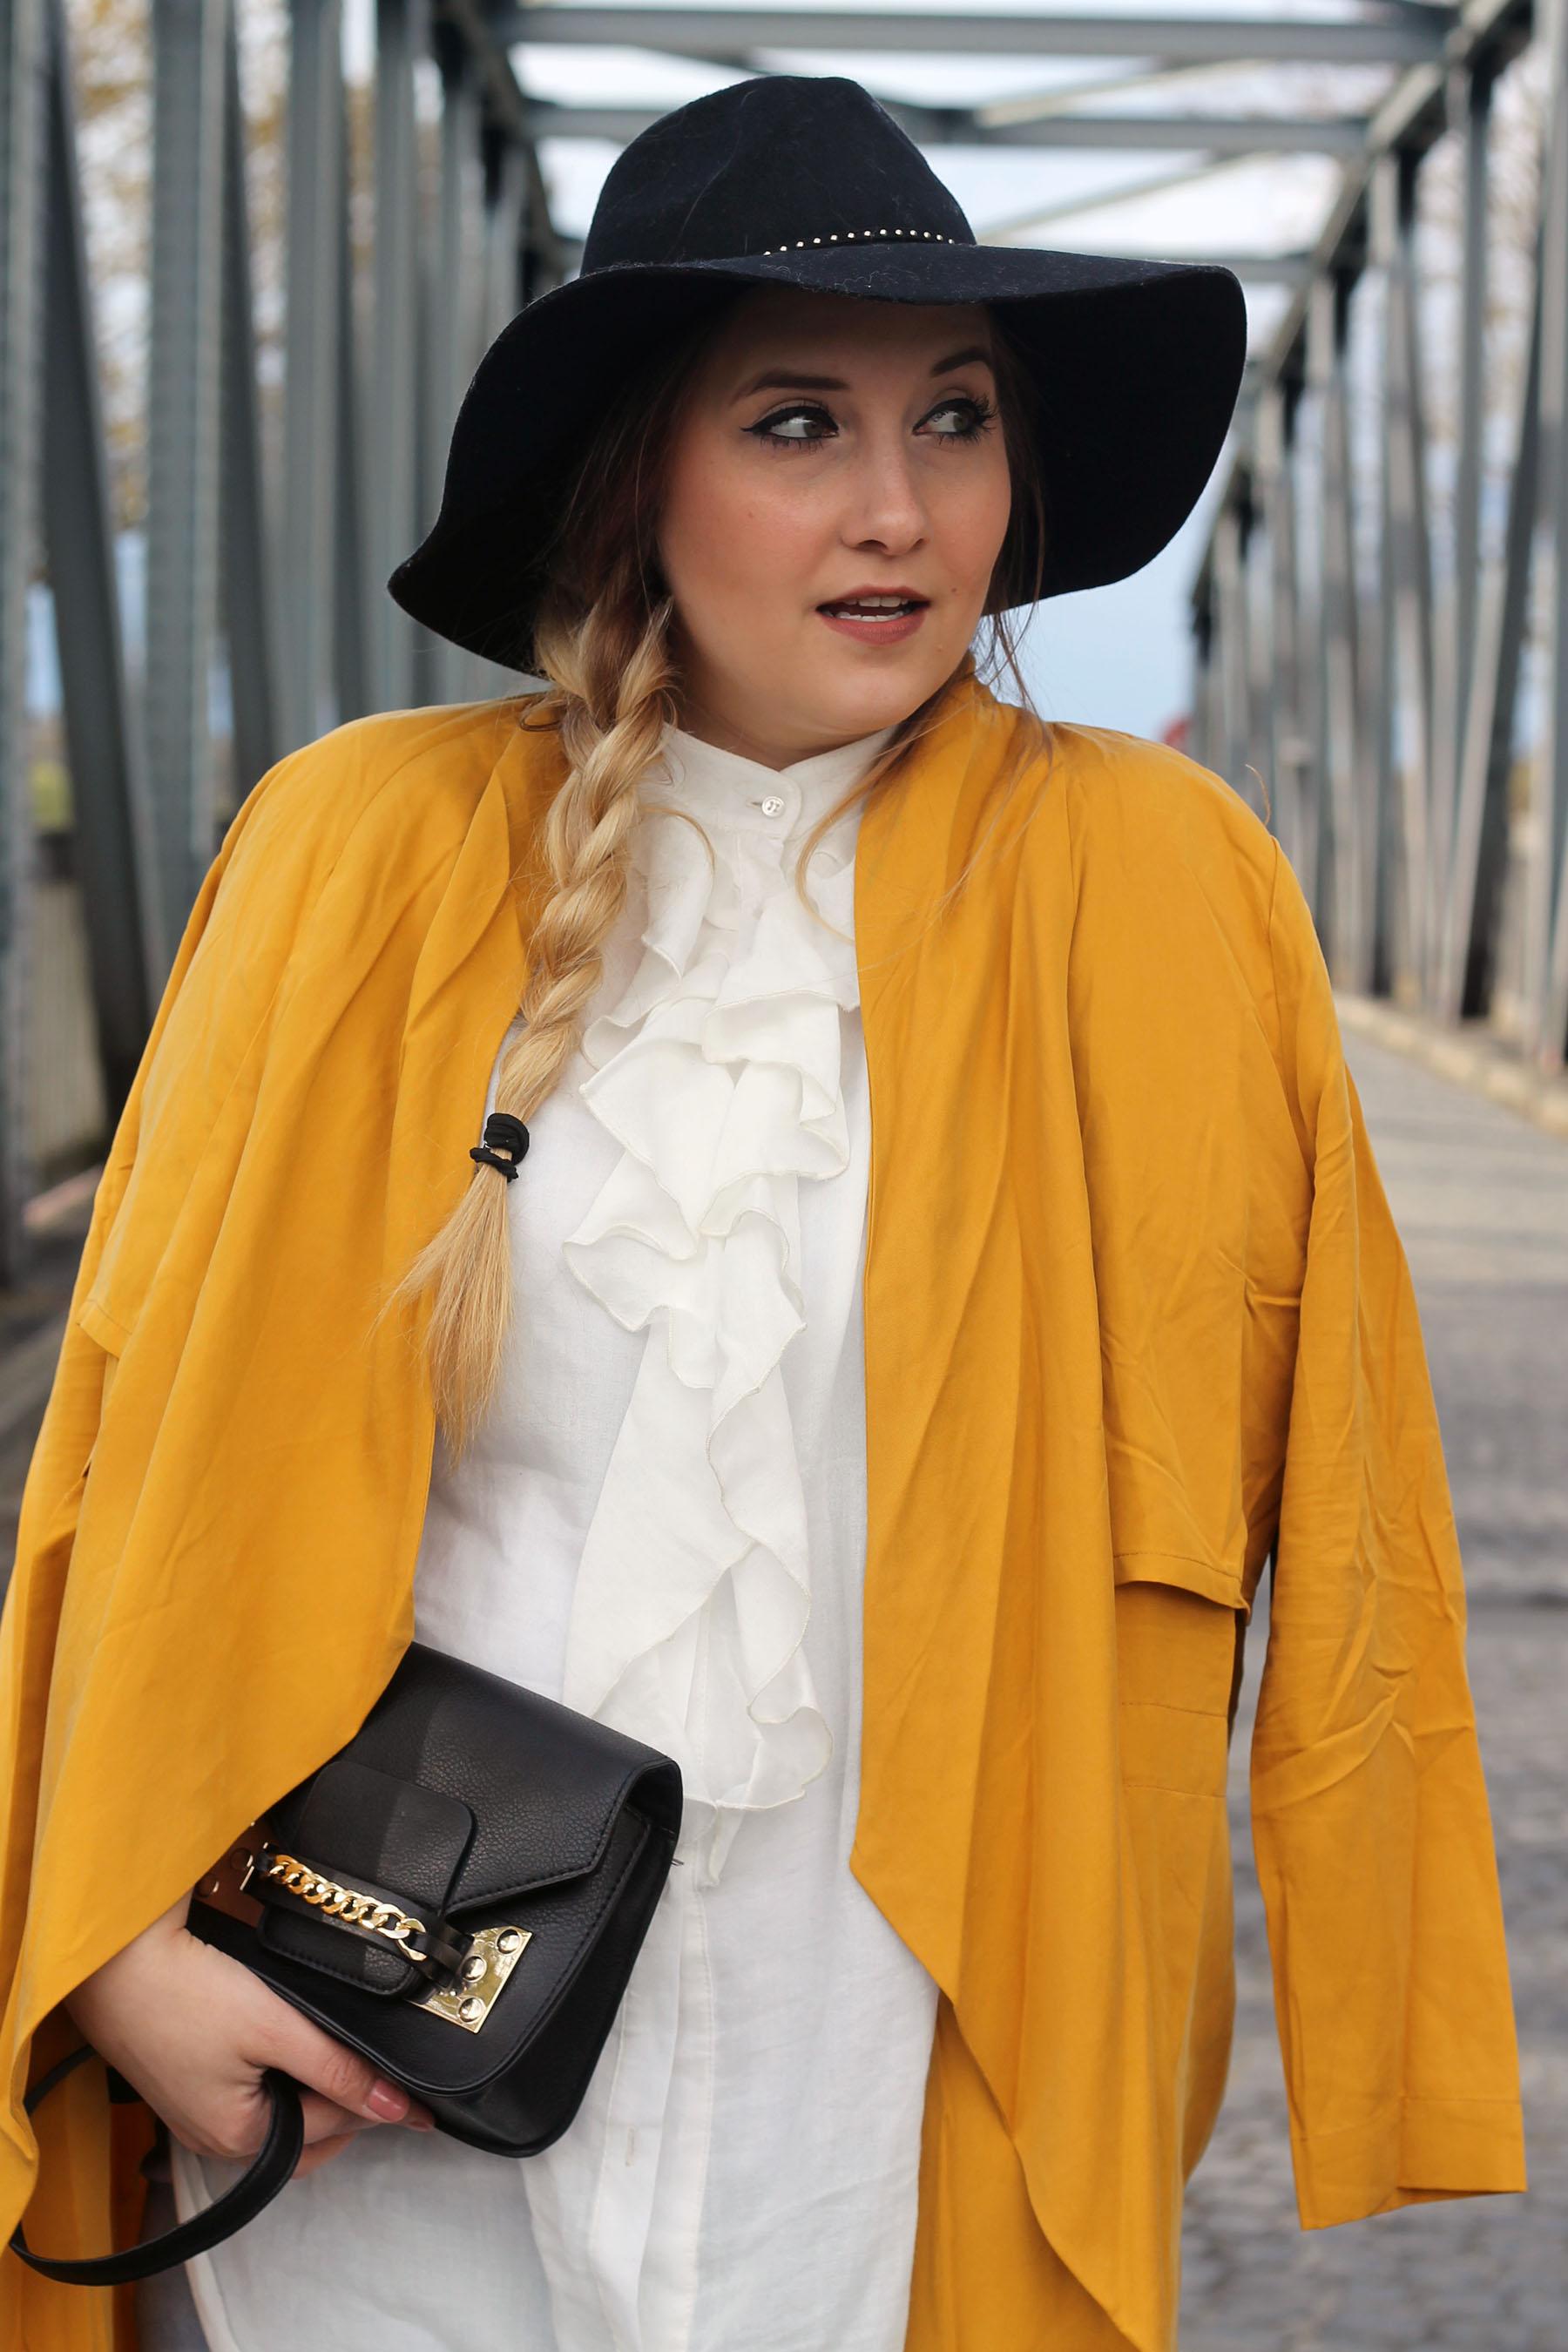 modeblog-fashionblog-gelber-mantel-top-blogger